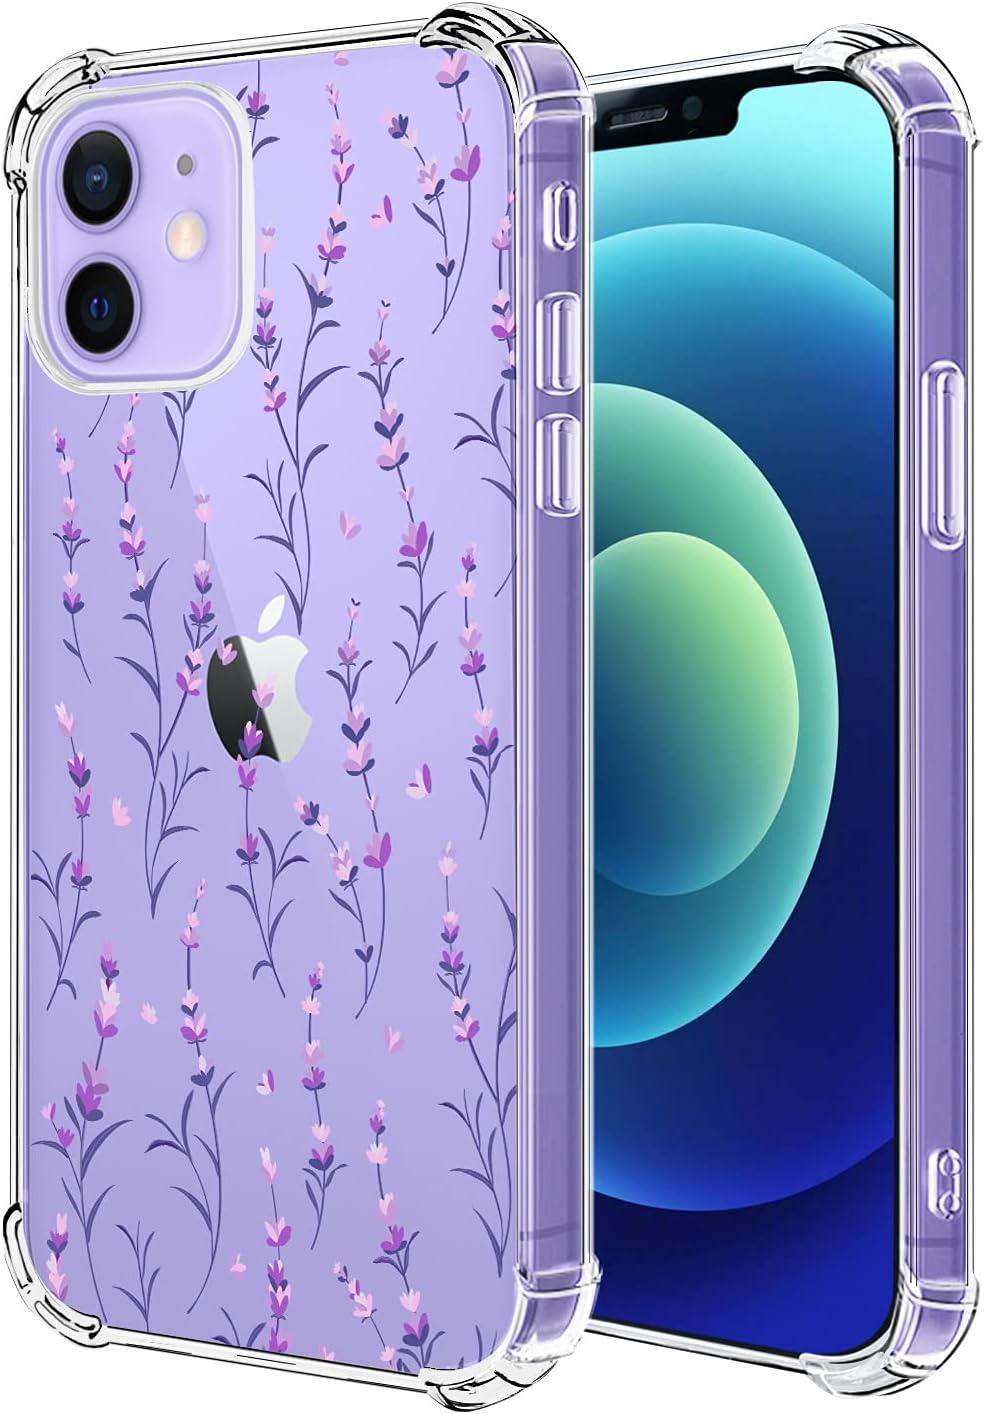 Hepix Clear Lavender Flower Case Compatible with iPhone 12 Mini, Cute Pretty iPhone 12 Mini Case Purple Floral Design for Girl Women TPU Bumper Protective Anti-Scratch Cover for iPhone 12 Mini